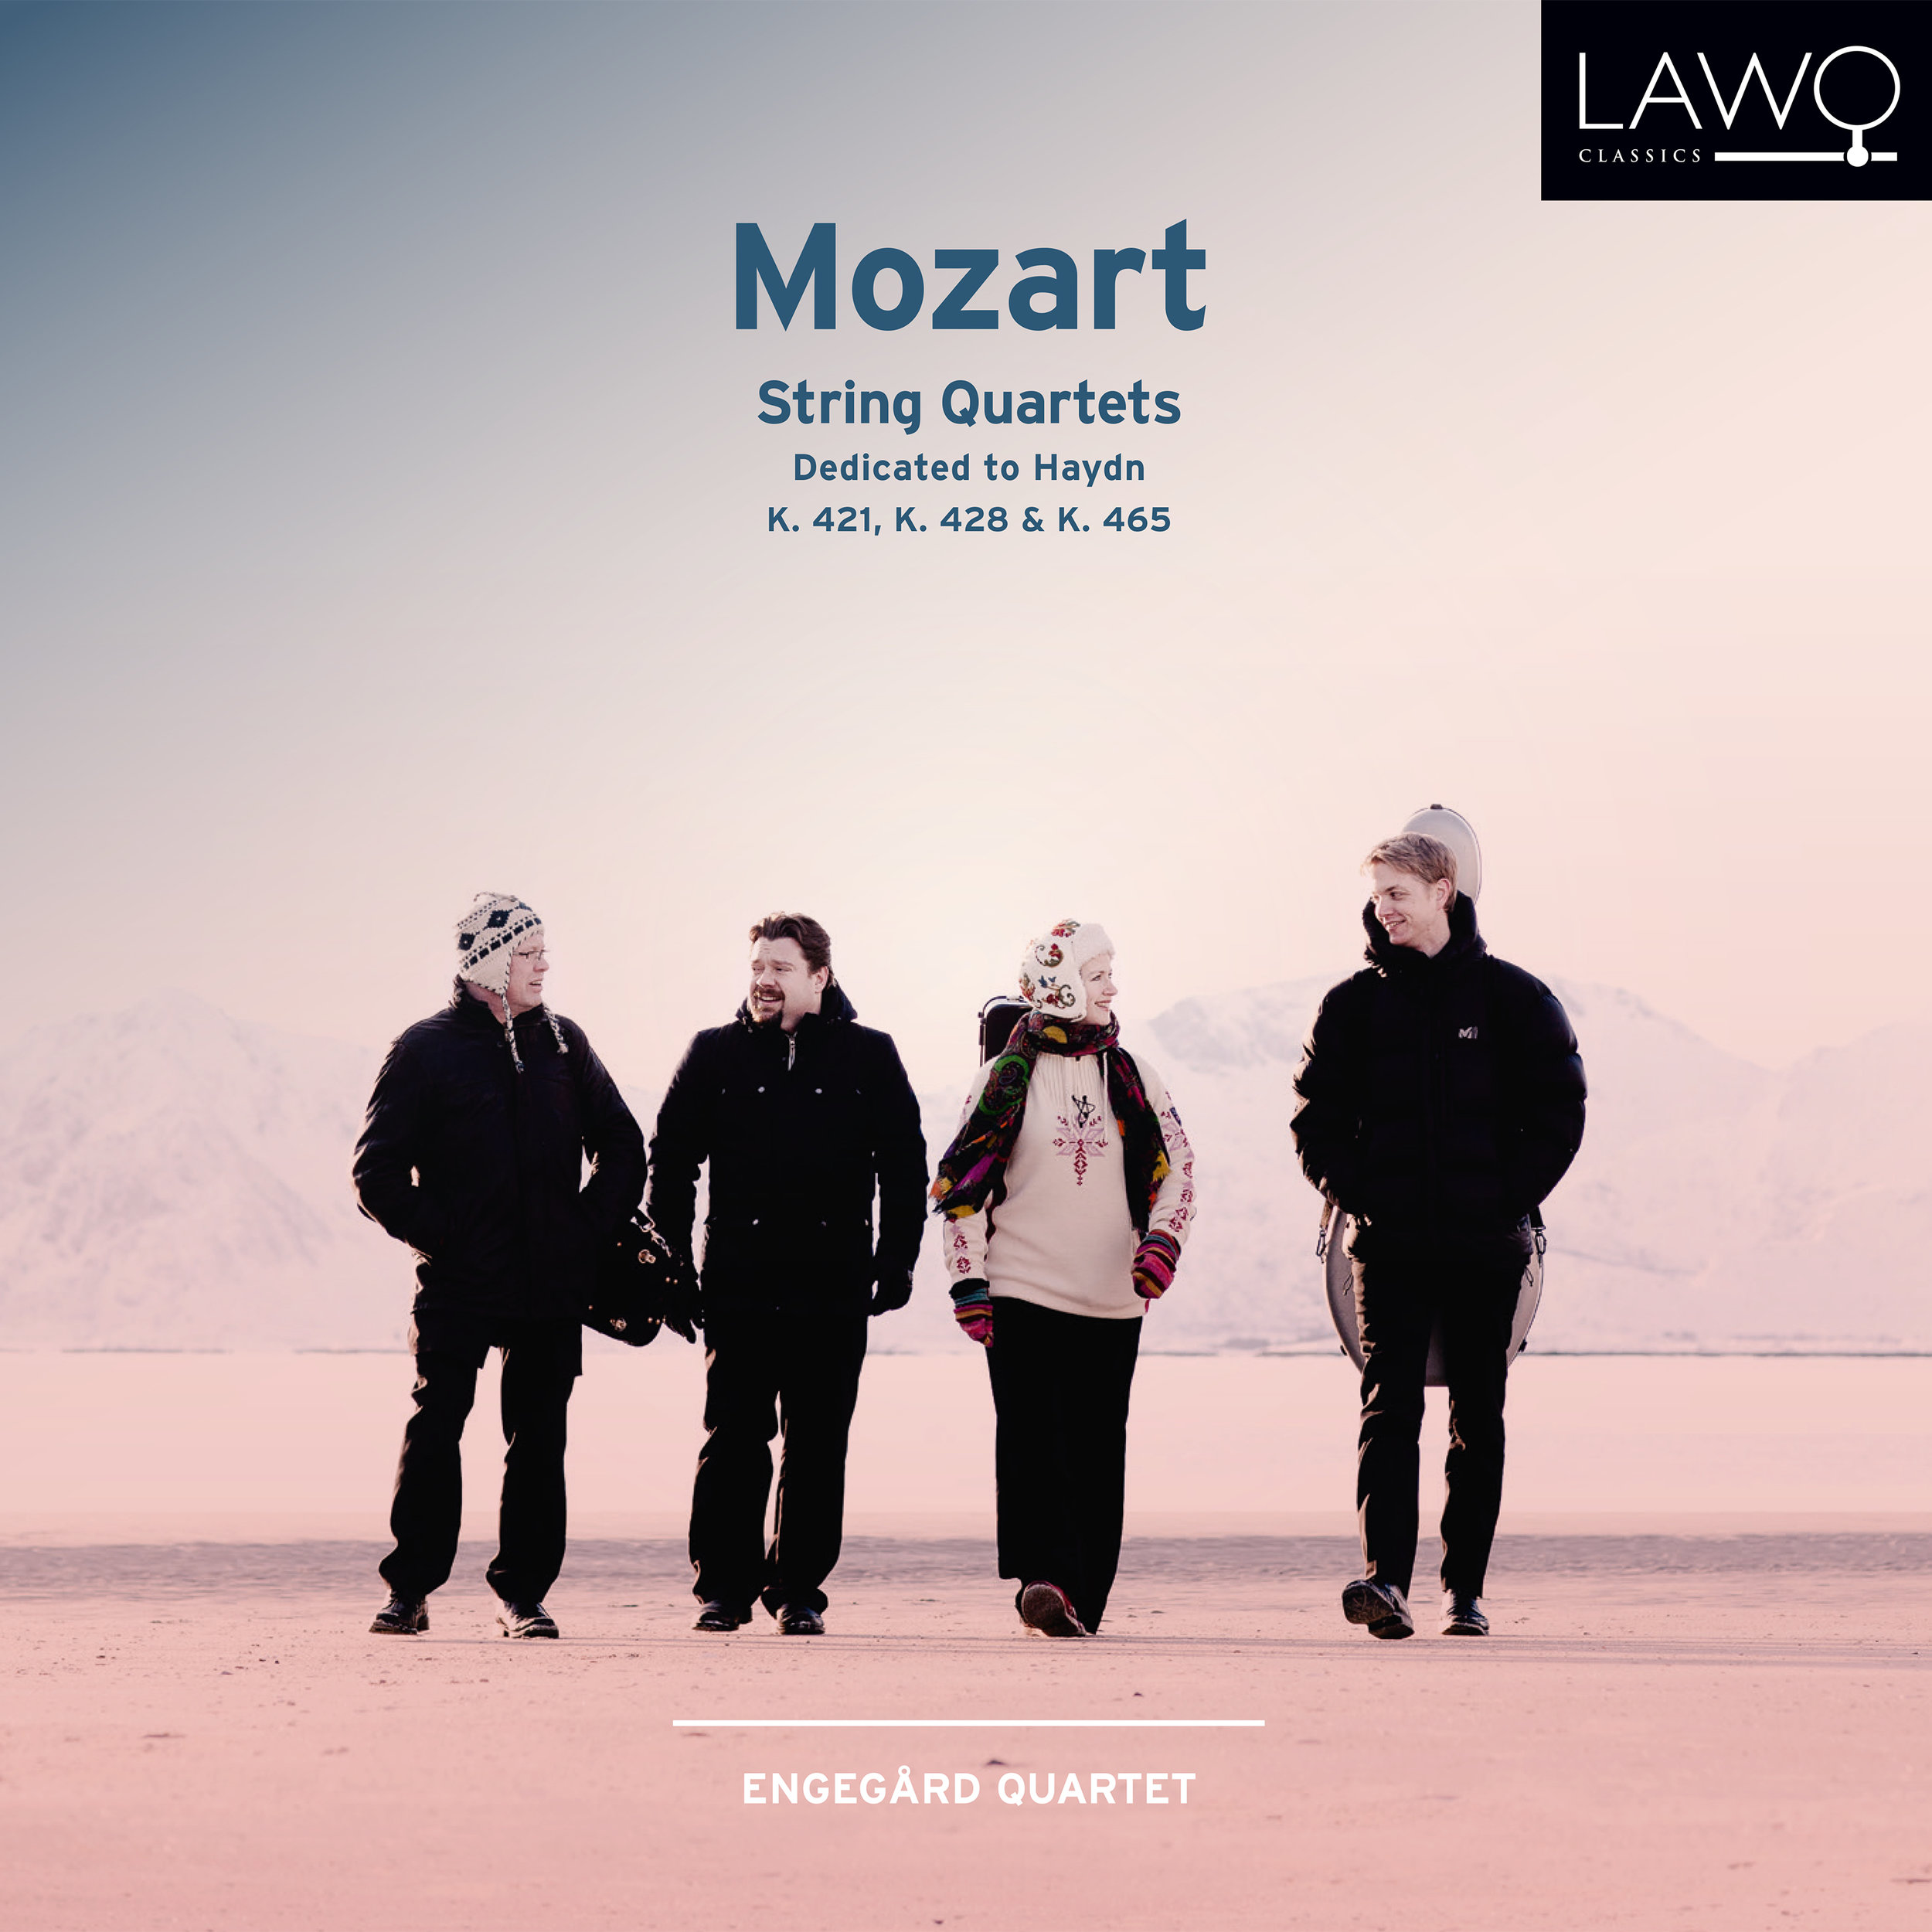 LWC1167_Engegard_Quartet_Mozart2_cover.jpg